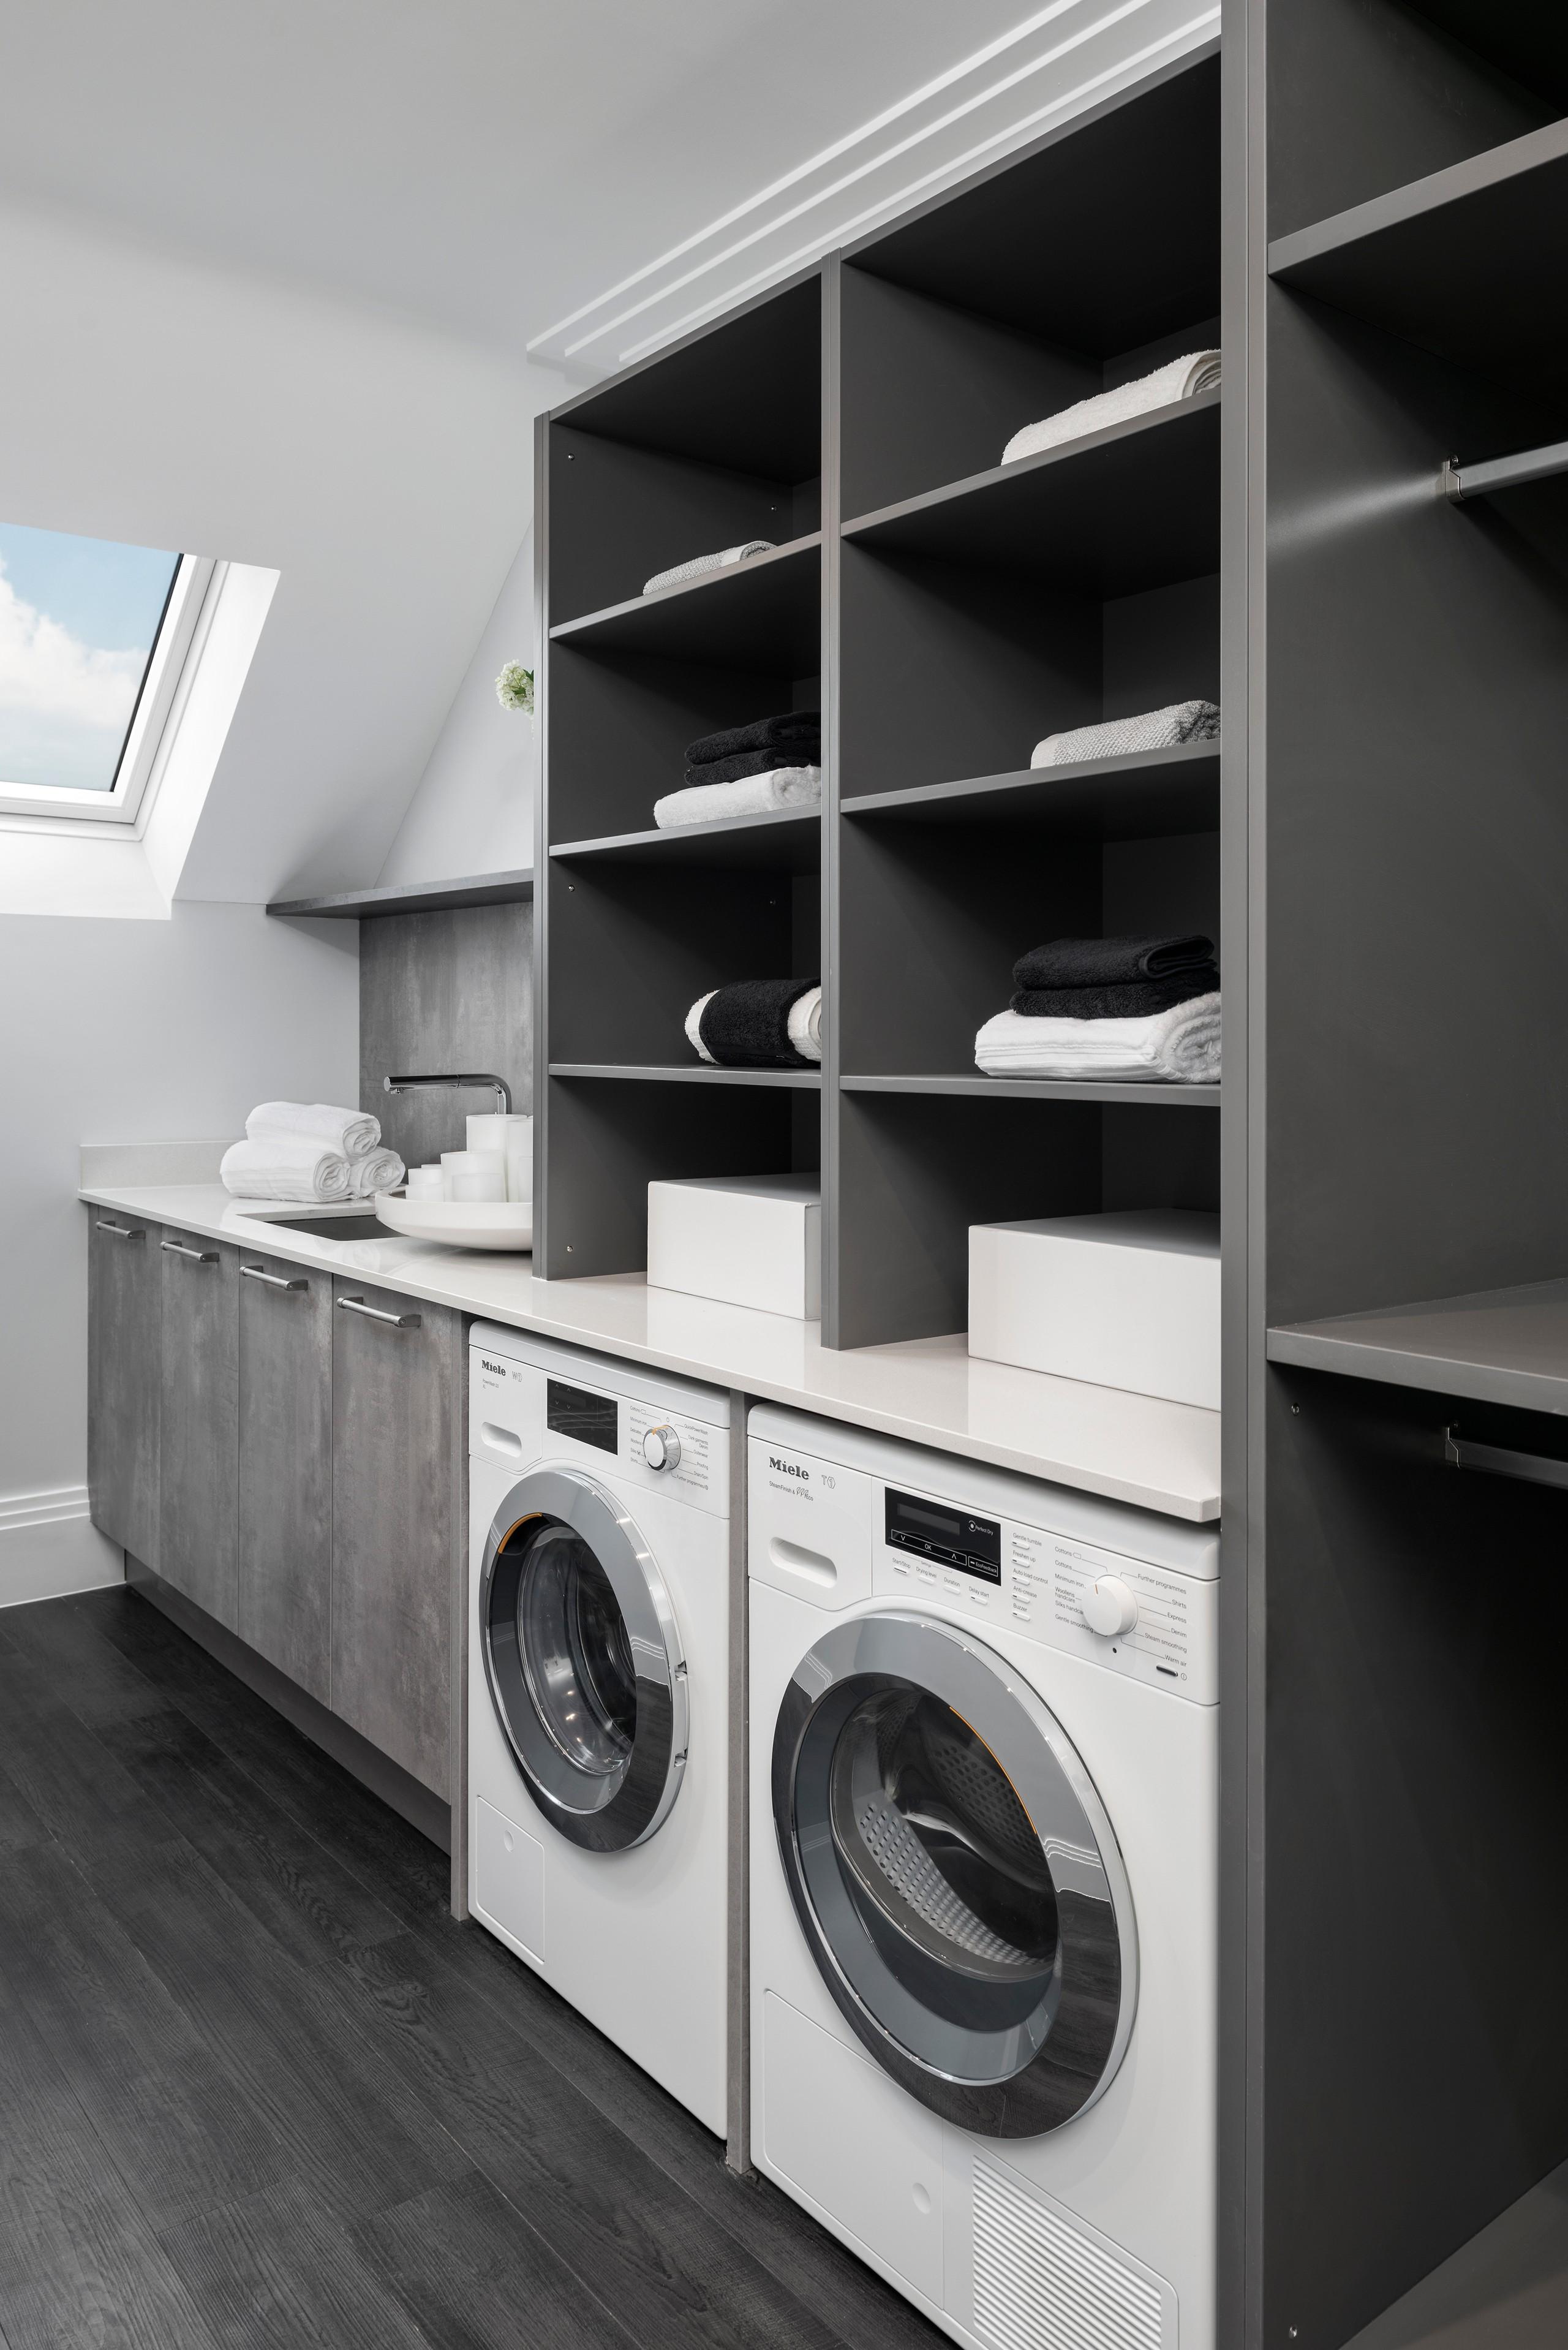 Combination Kitchen Laundry Room Ideas Photos Houzz